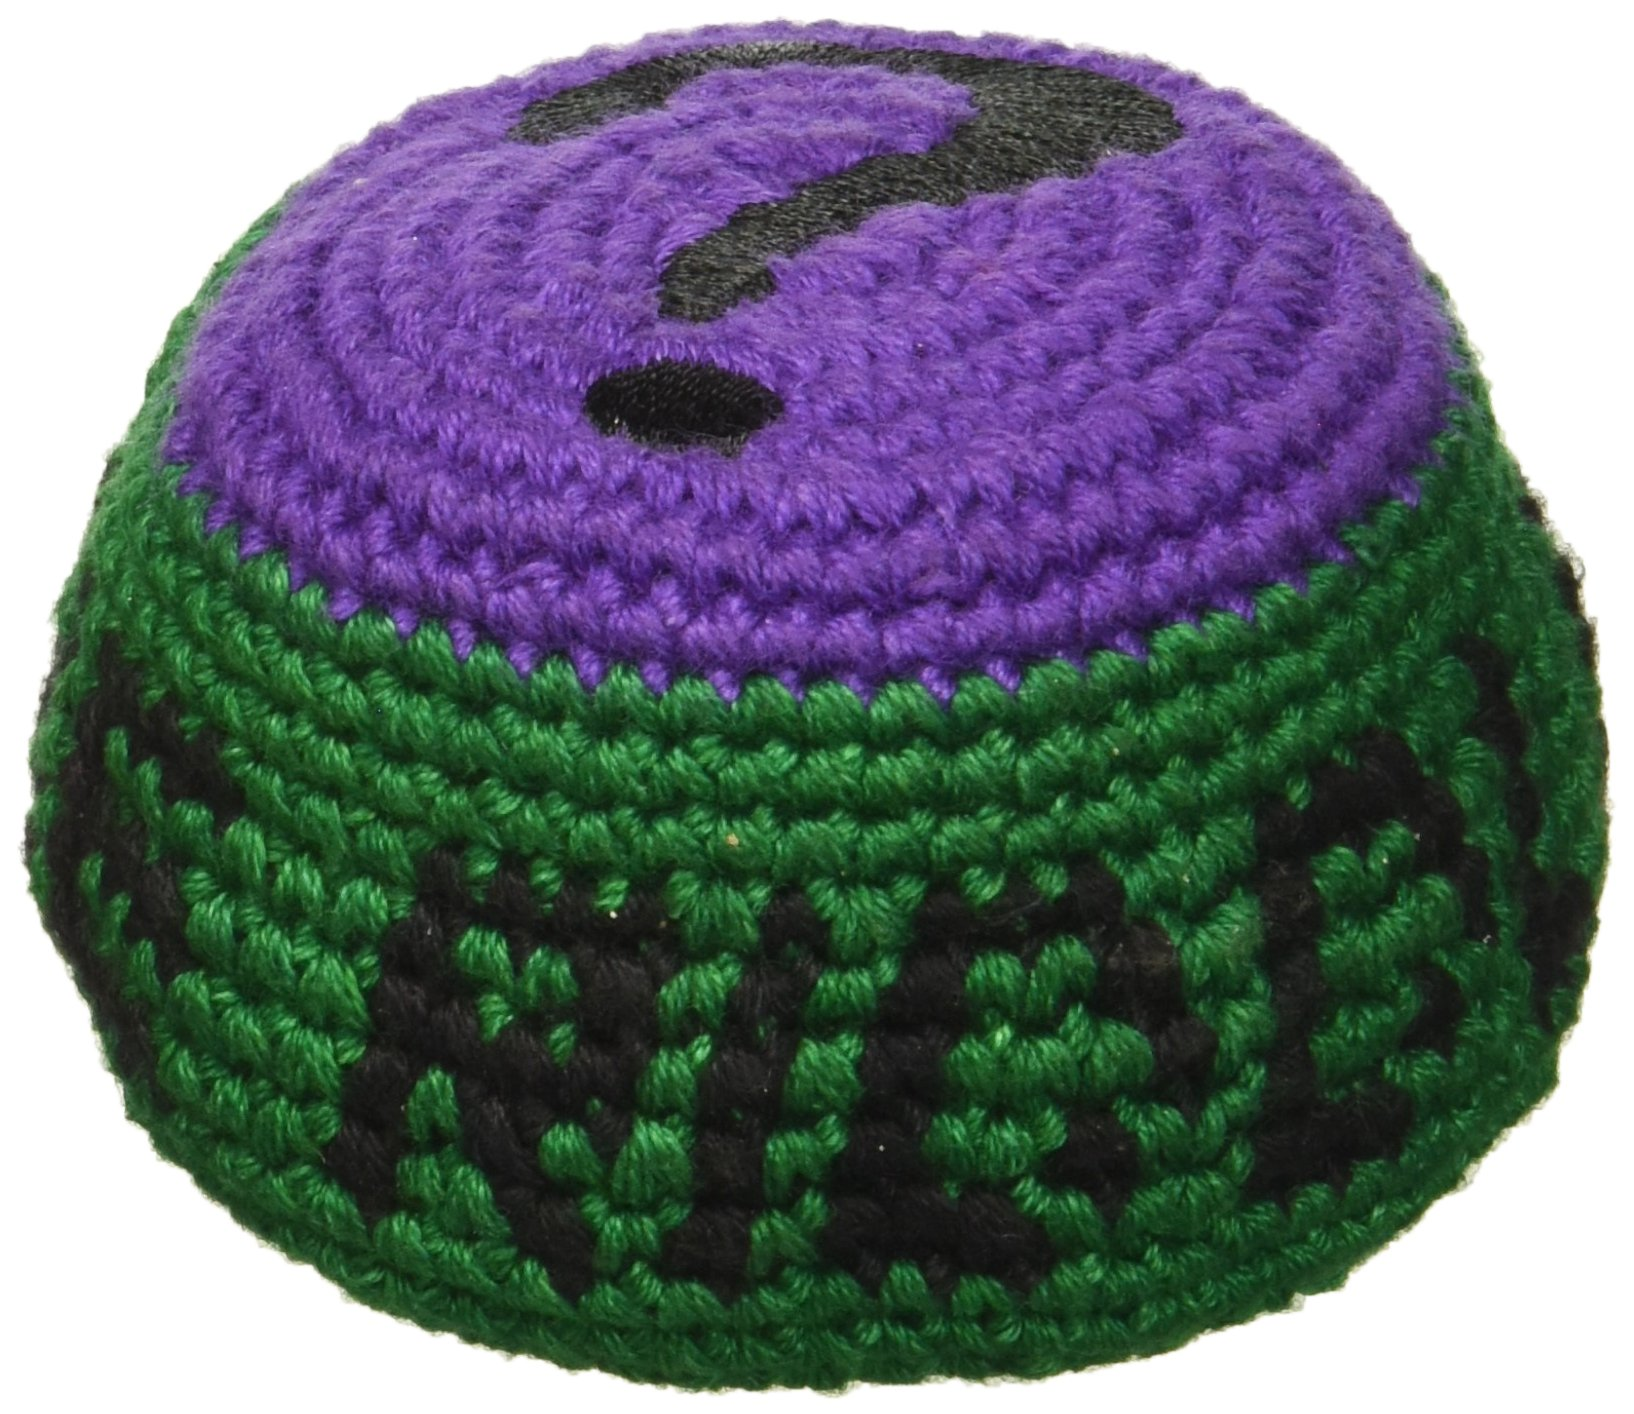 Batman The Riddler Embroidered Crocheted Footbag